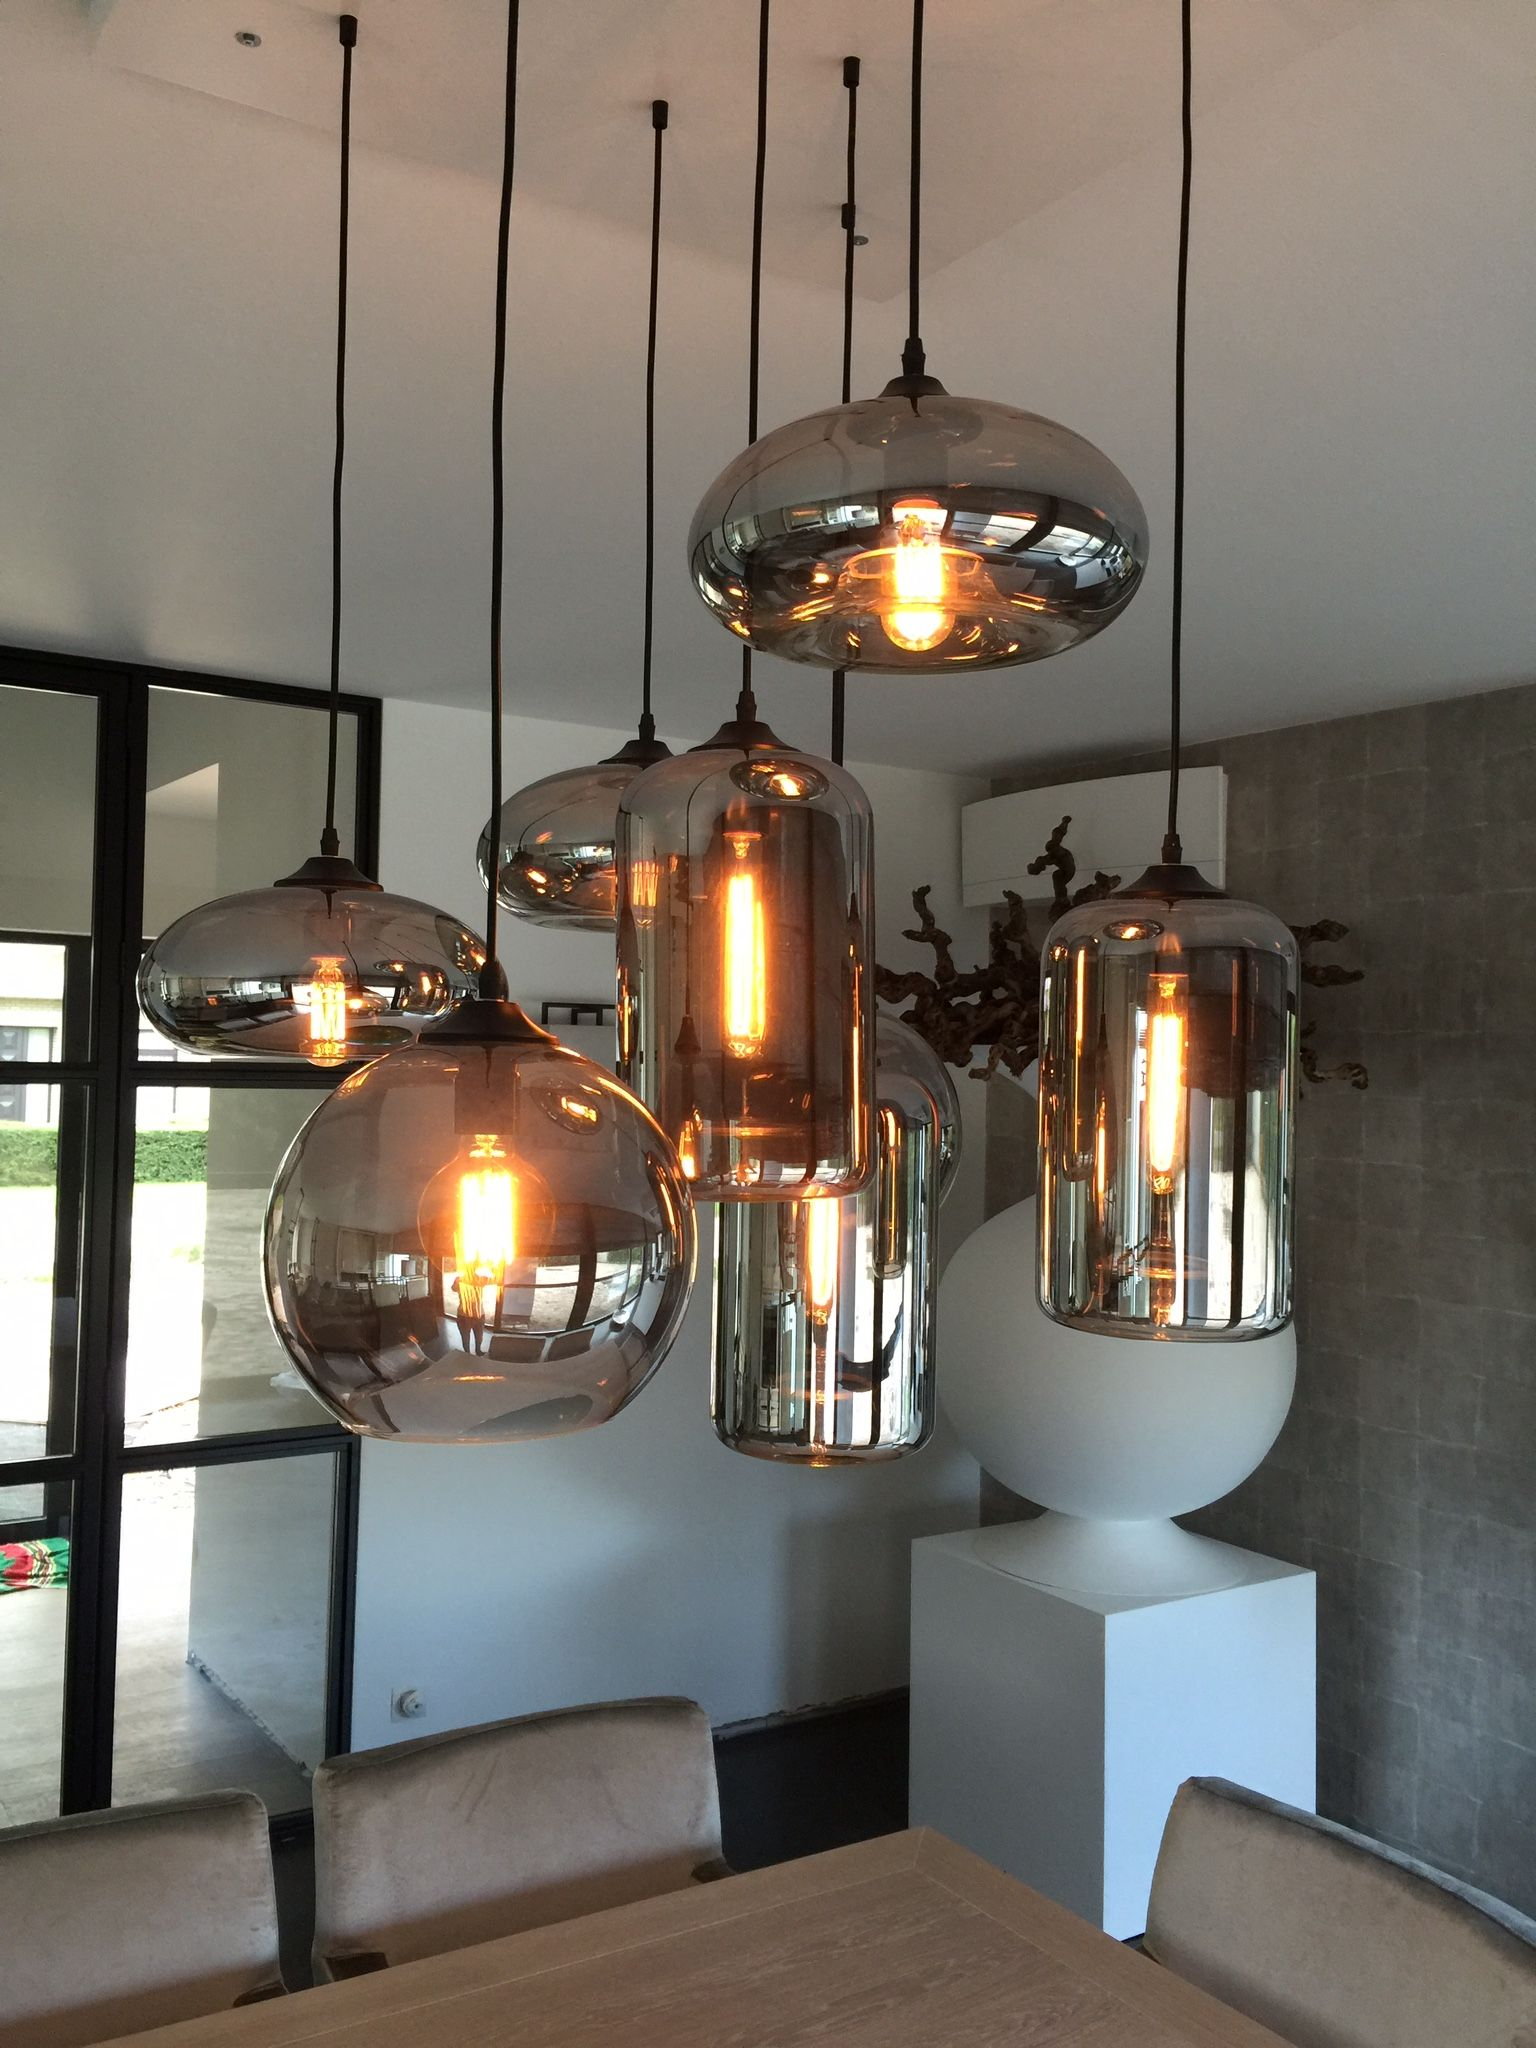 Pin von anders enqvist auf lampor pinterest for Lampen eettafel design